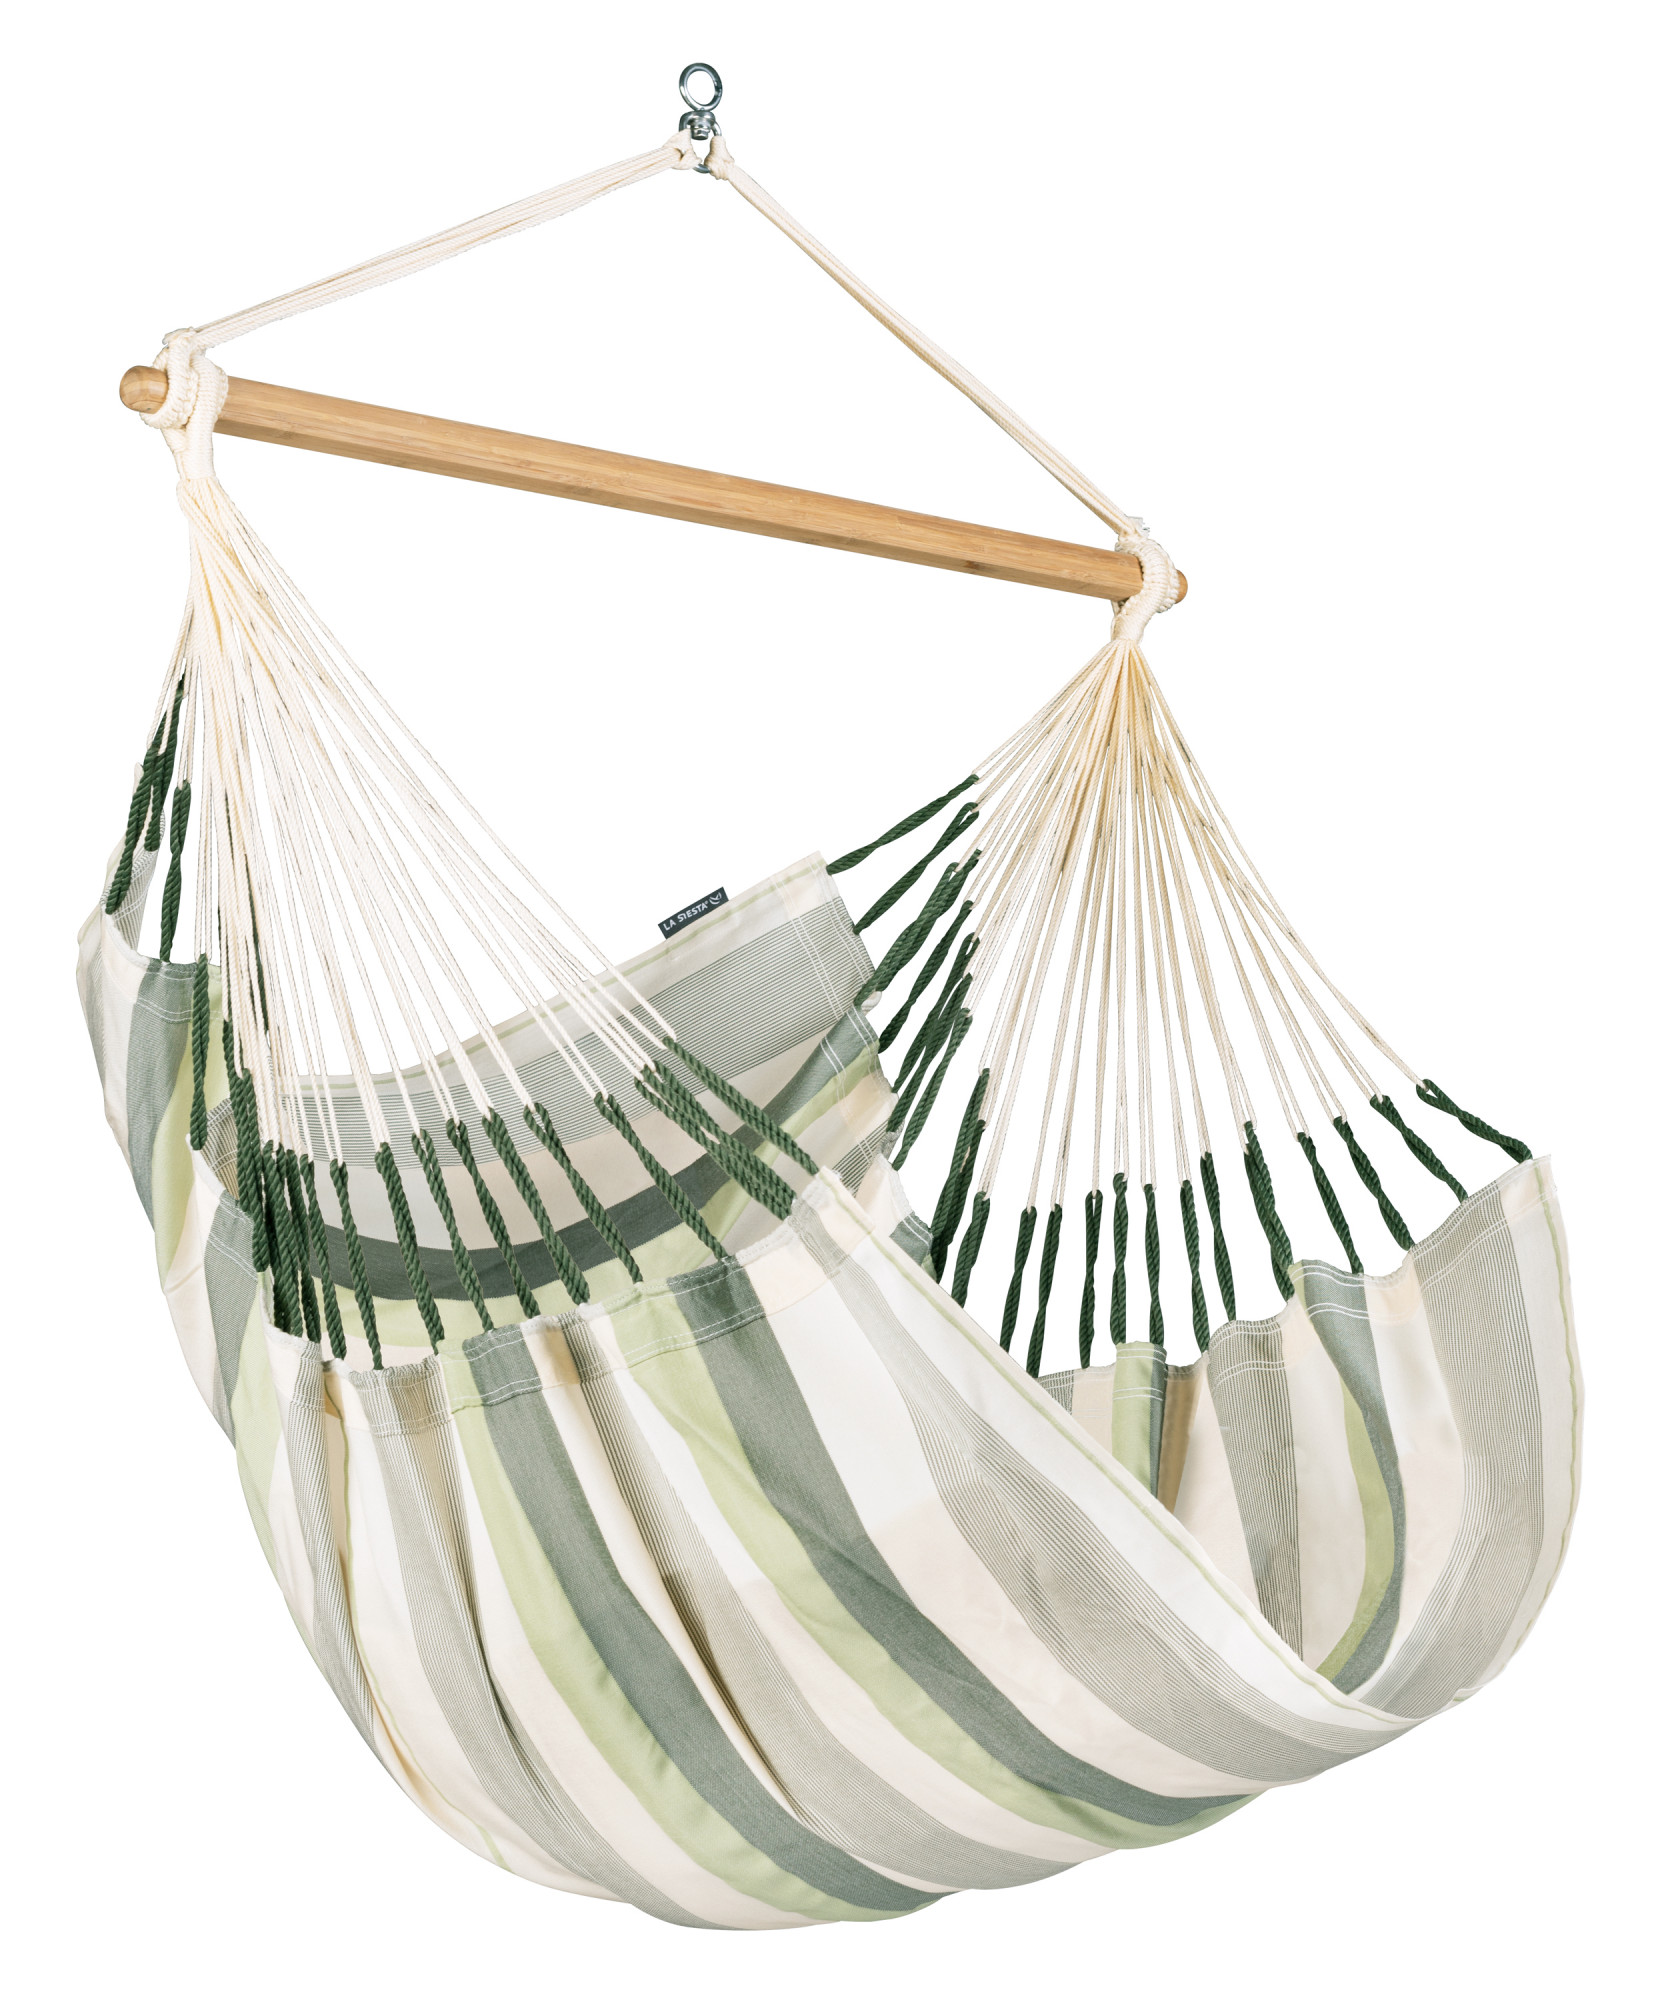 Chaise-hamac comfort en tissu vert clair